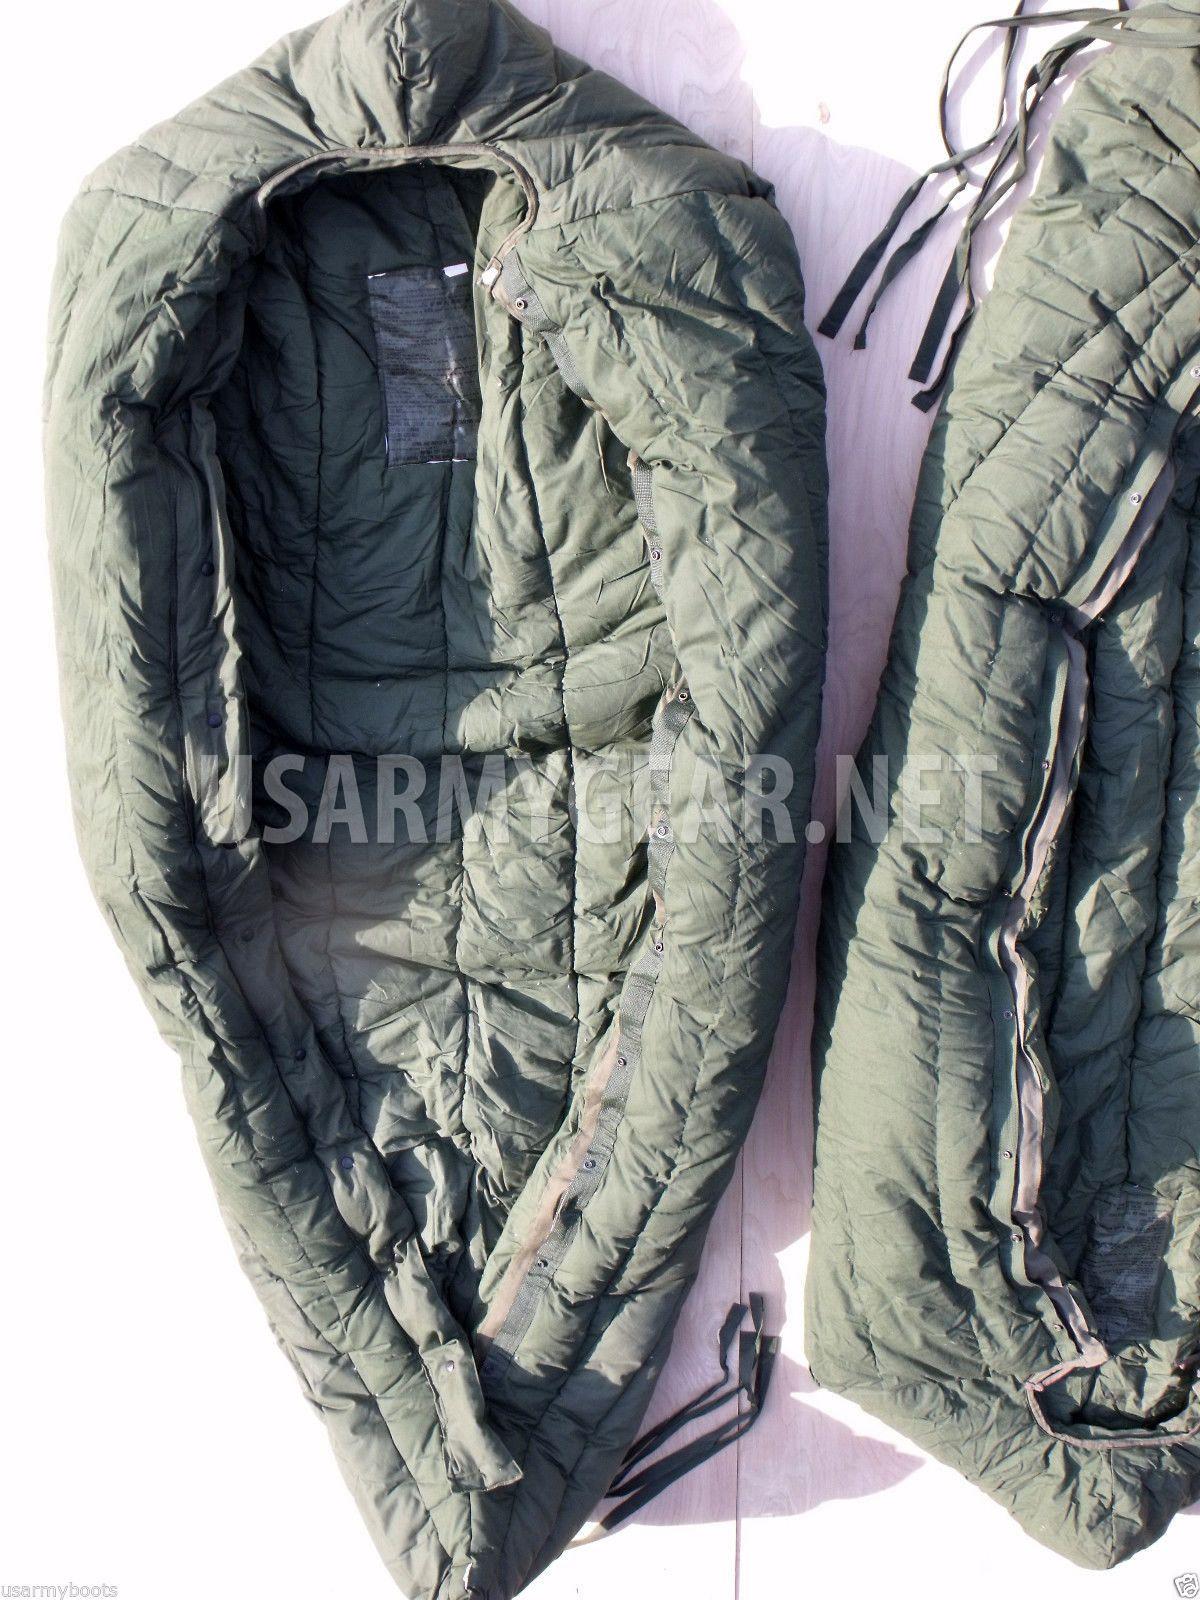 Made In Usa Subzero Extreme Cold Weather Sleeping Bag W